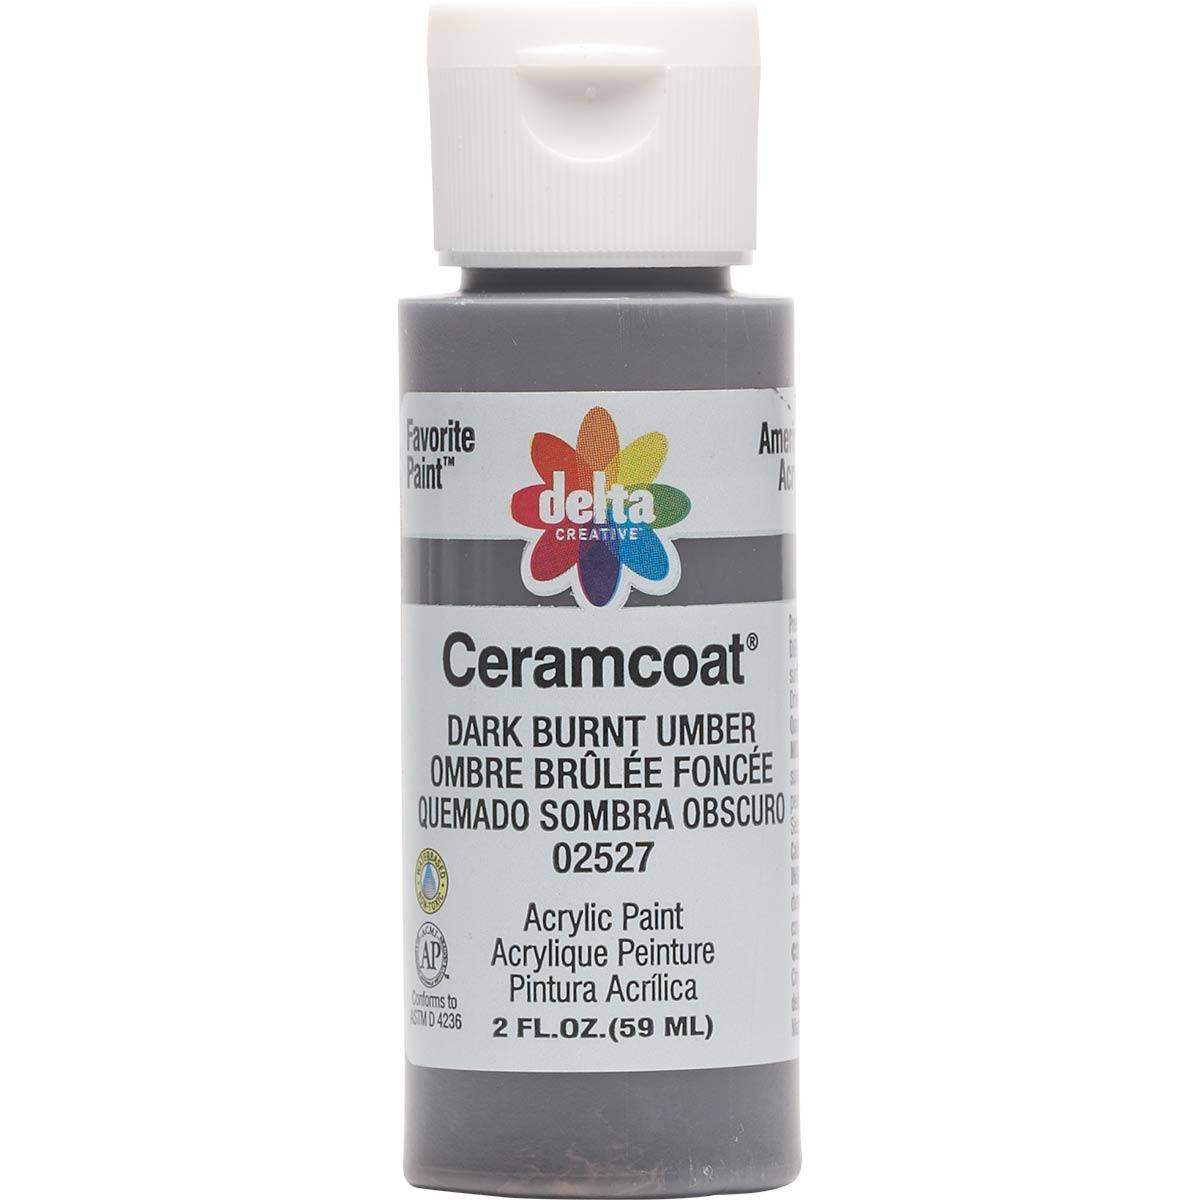 Delta Ceramcoat ® Acrylic Paint - Dark Burnt Umber, 2 oz.